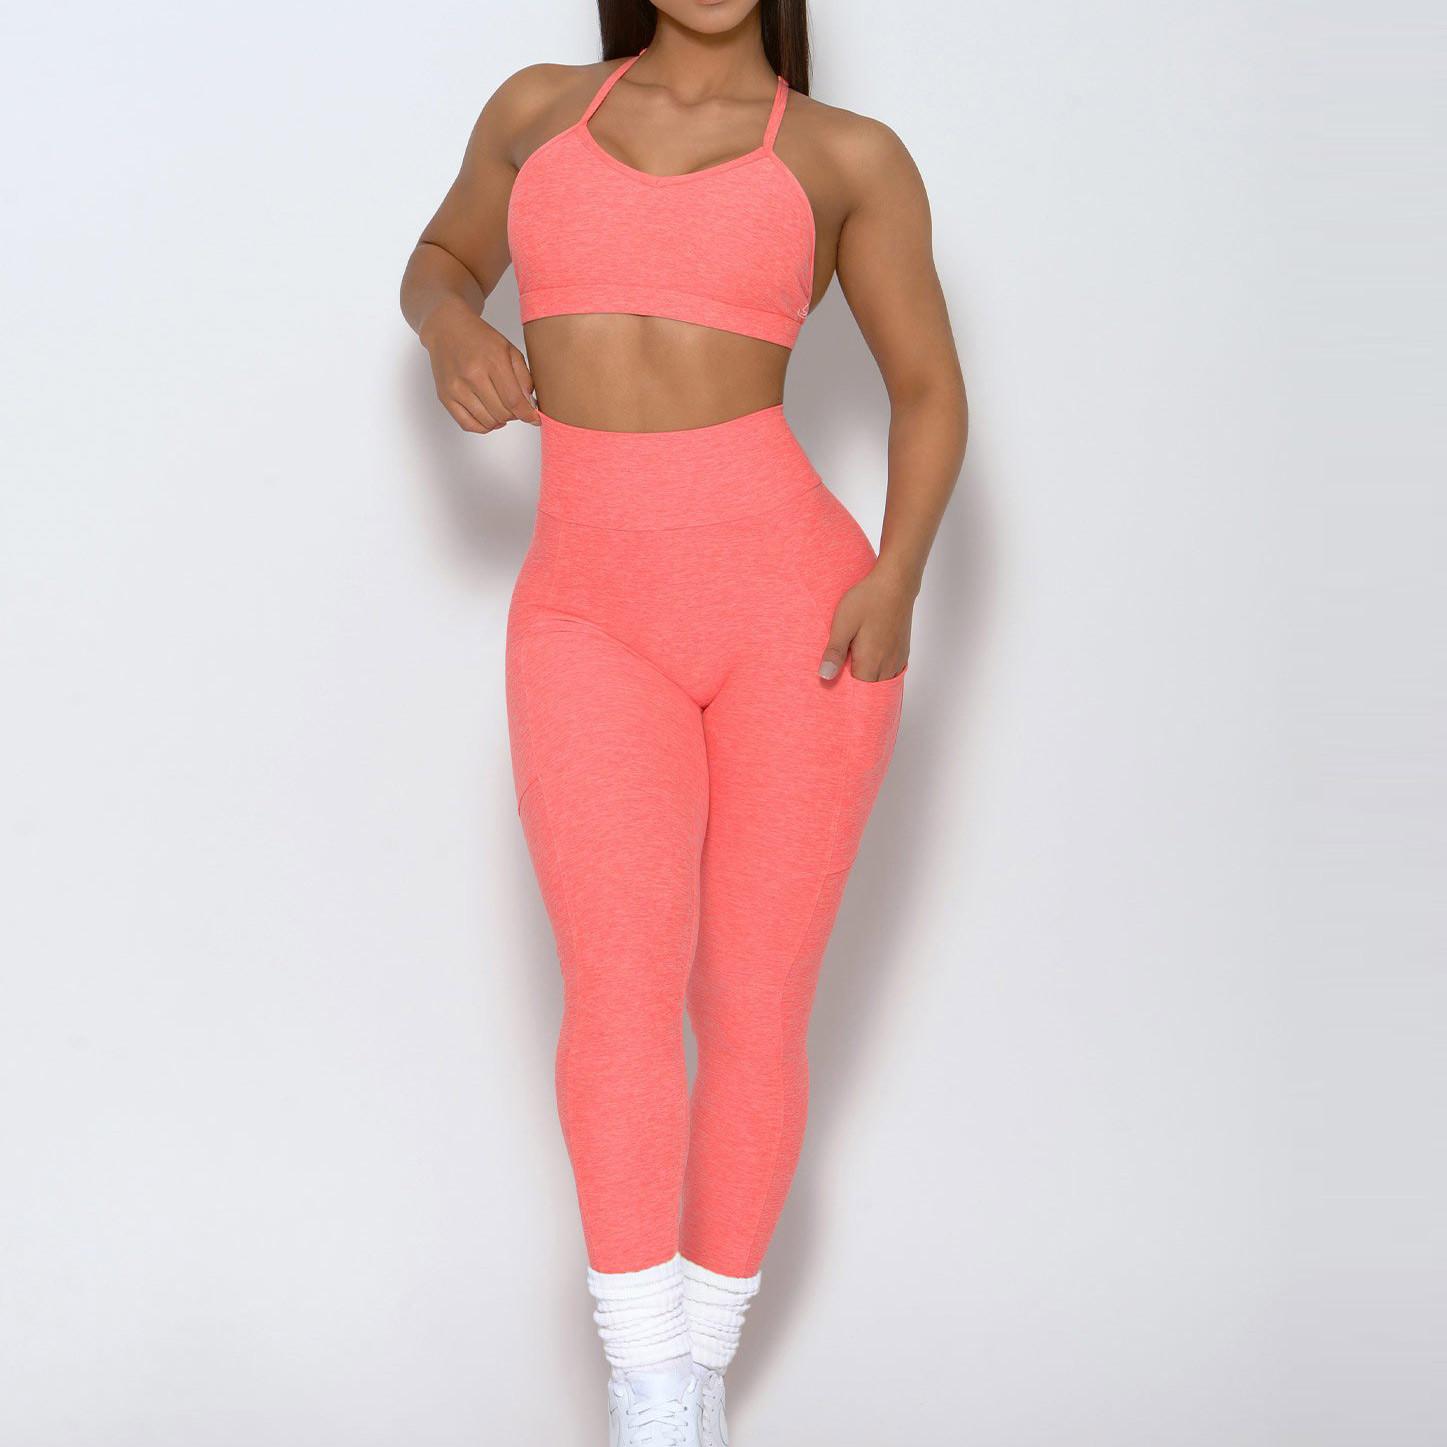 wholesale activewear